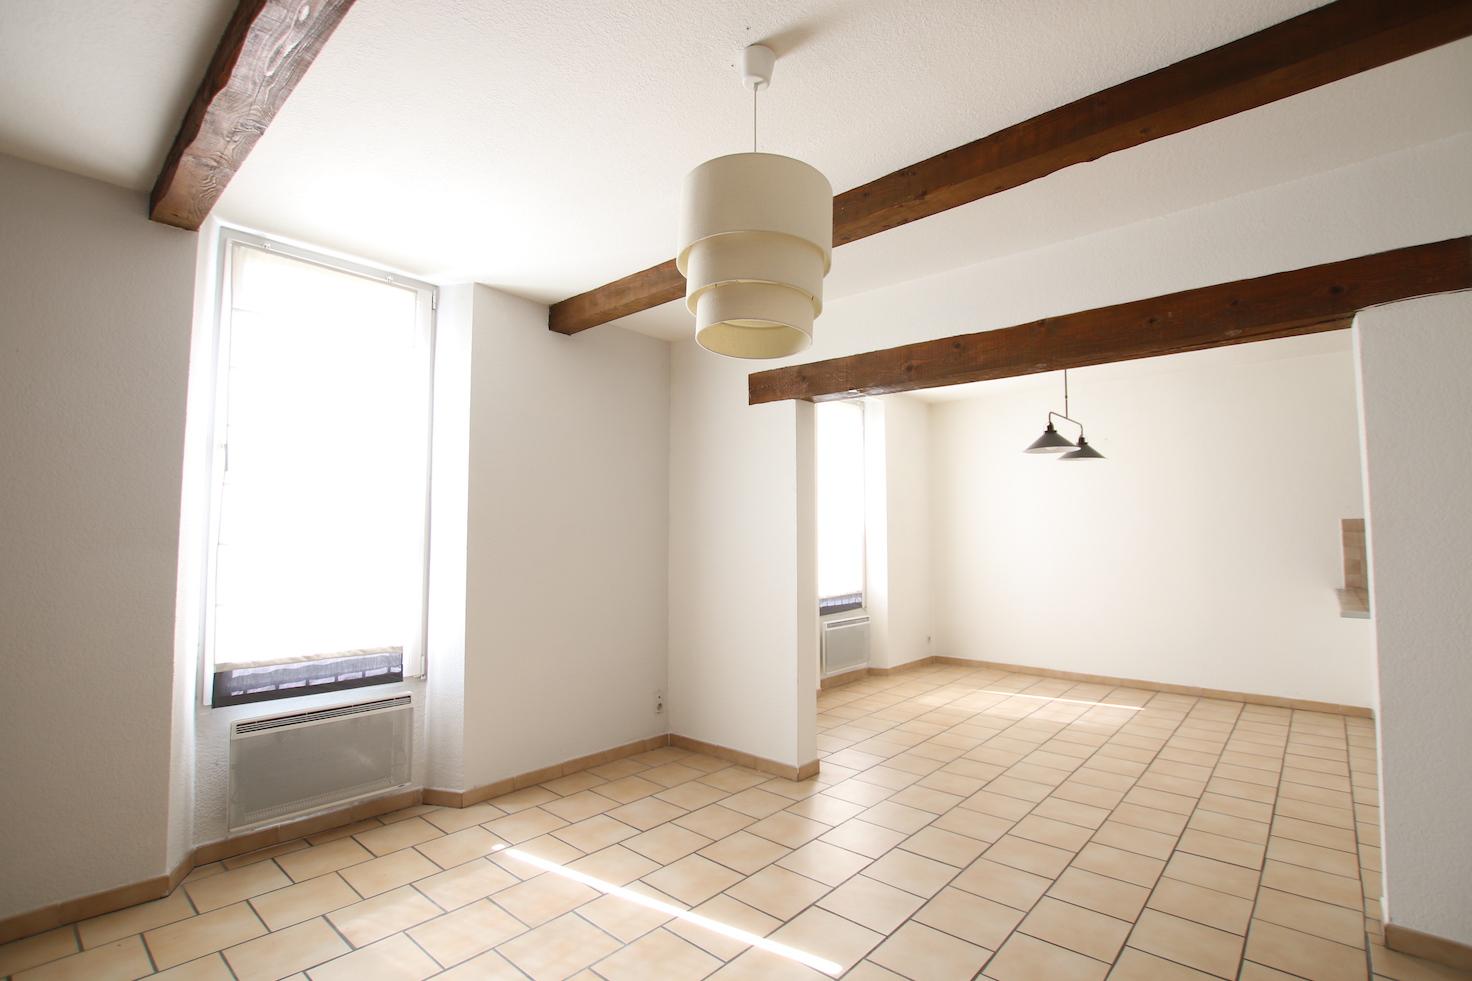 Carpentras : T3 spacieux avec balcon